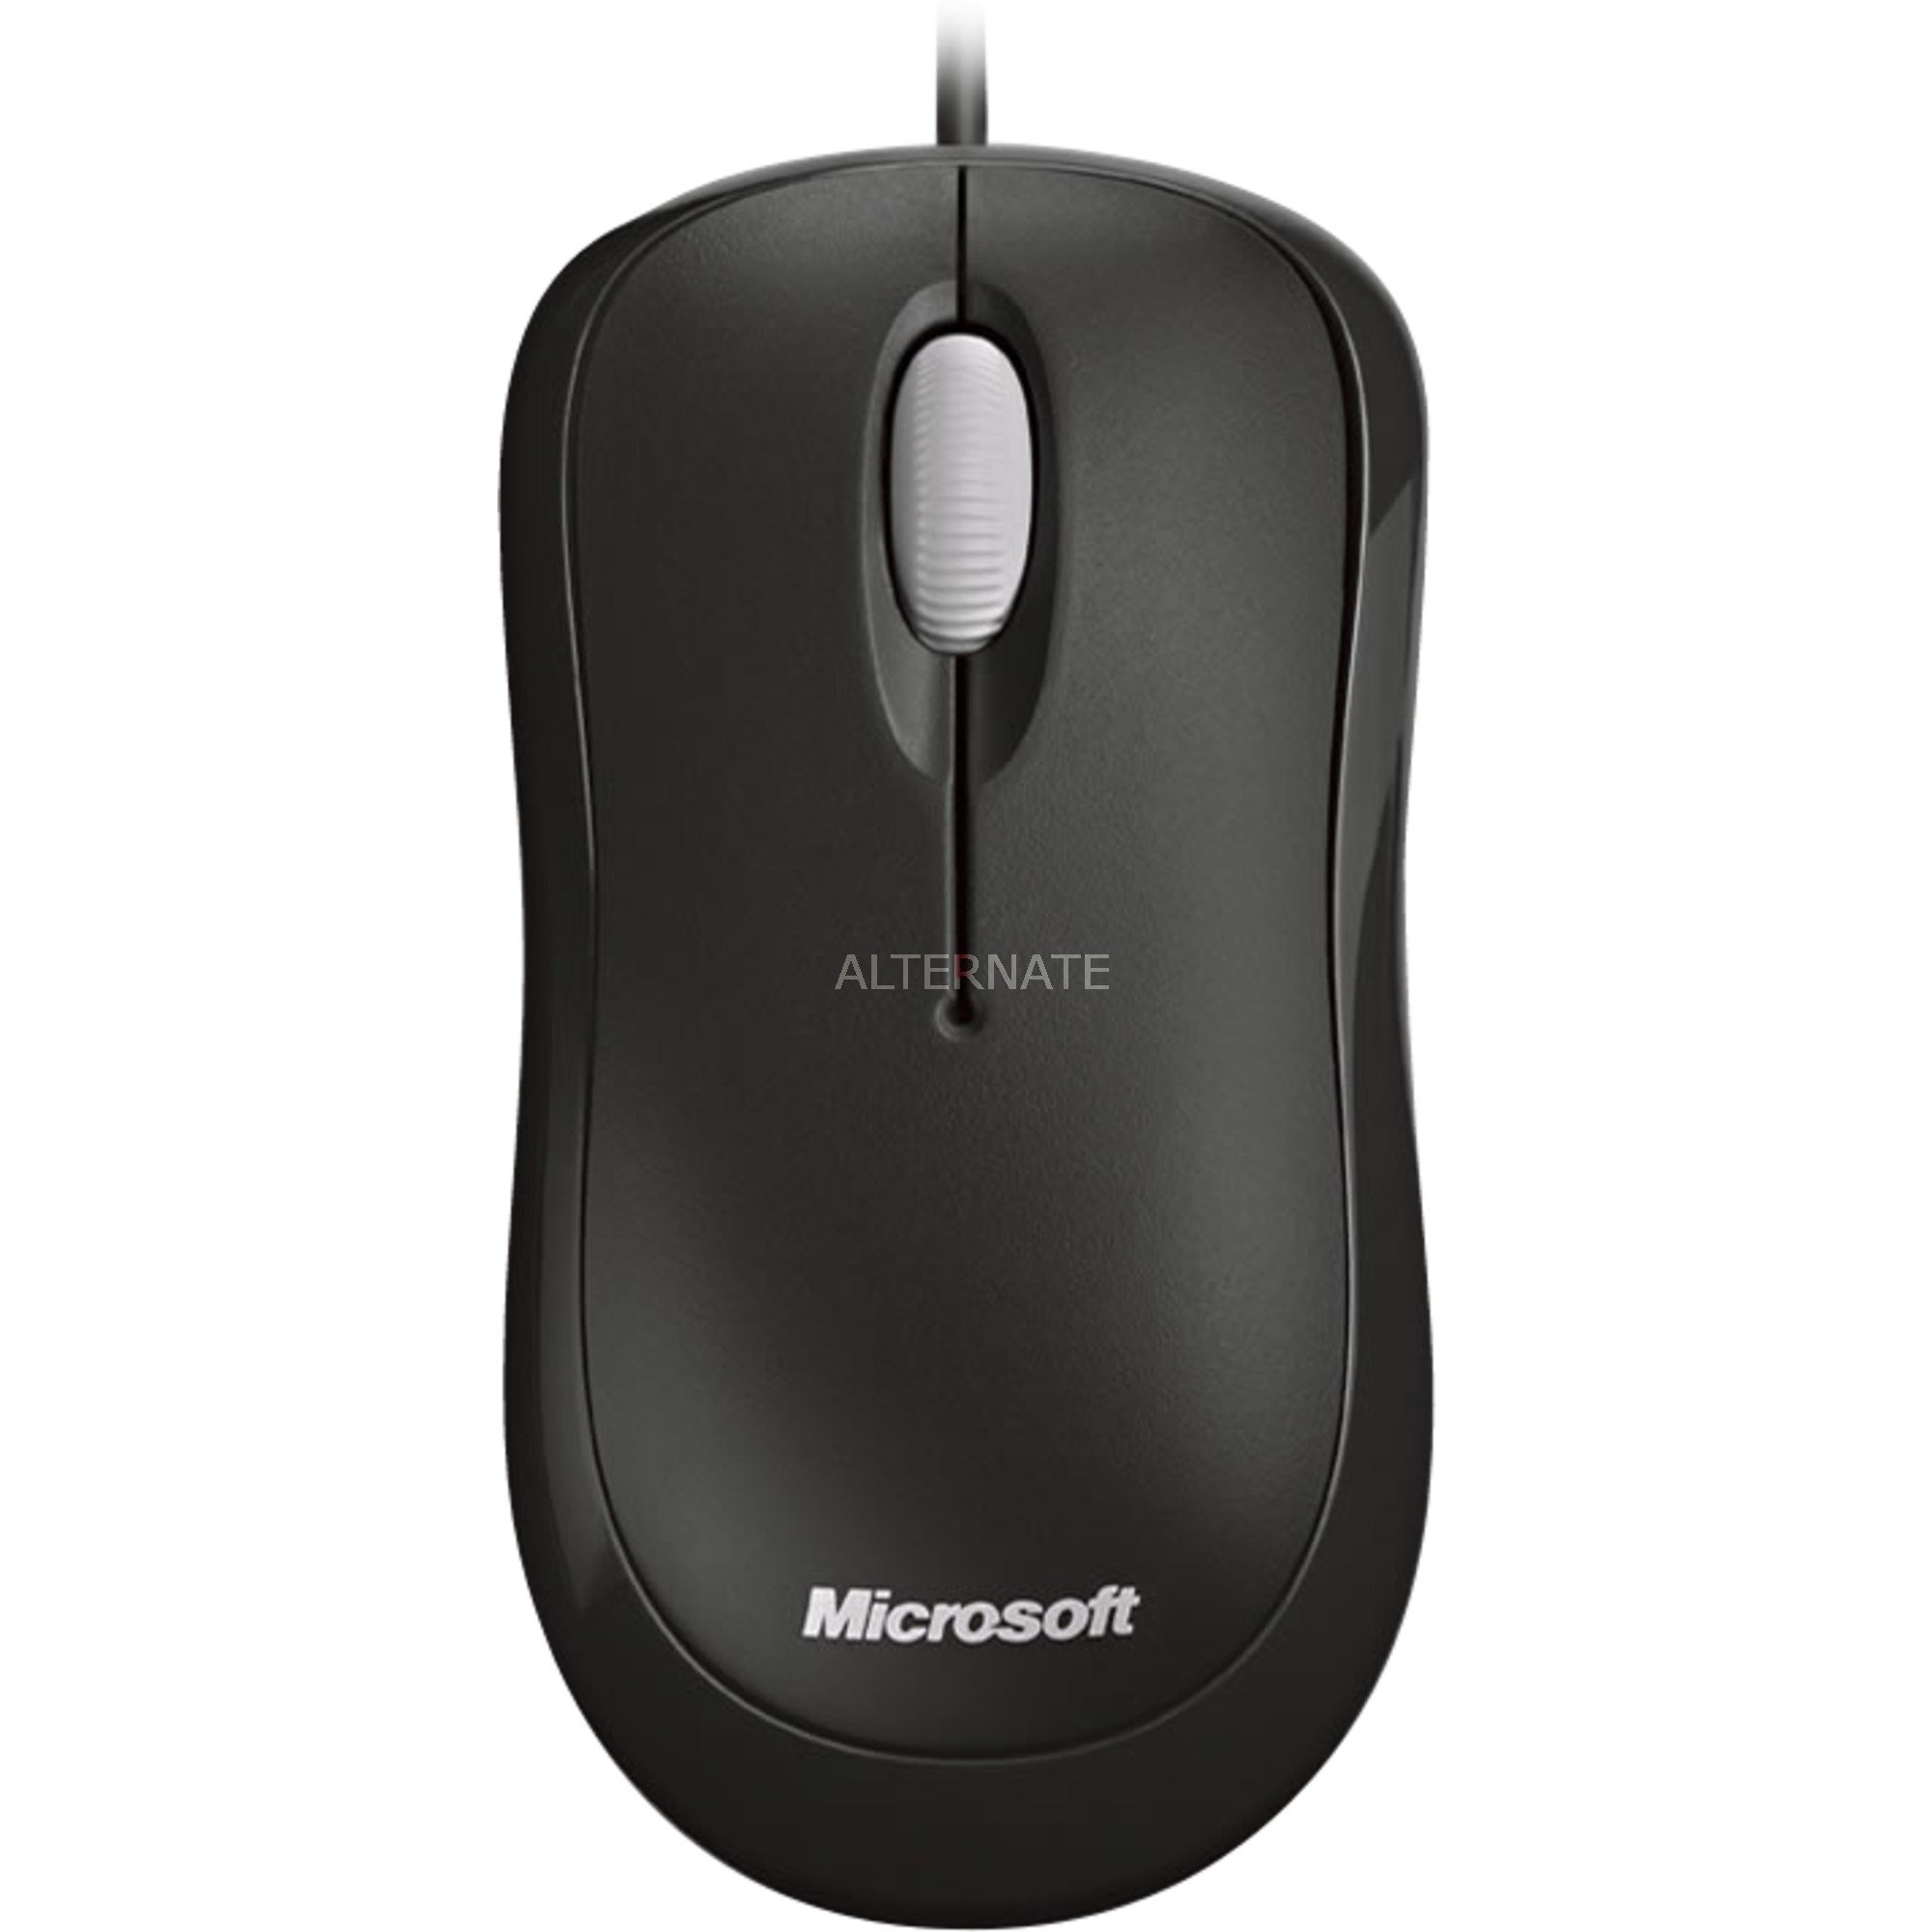 Basic Optical Mouse for Business ratón USB Óptico 800 DPI Ambidextro Negro